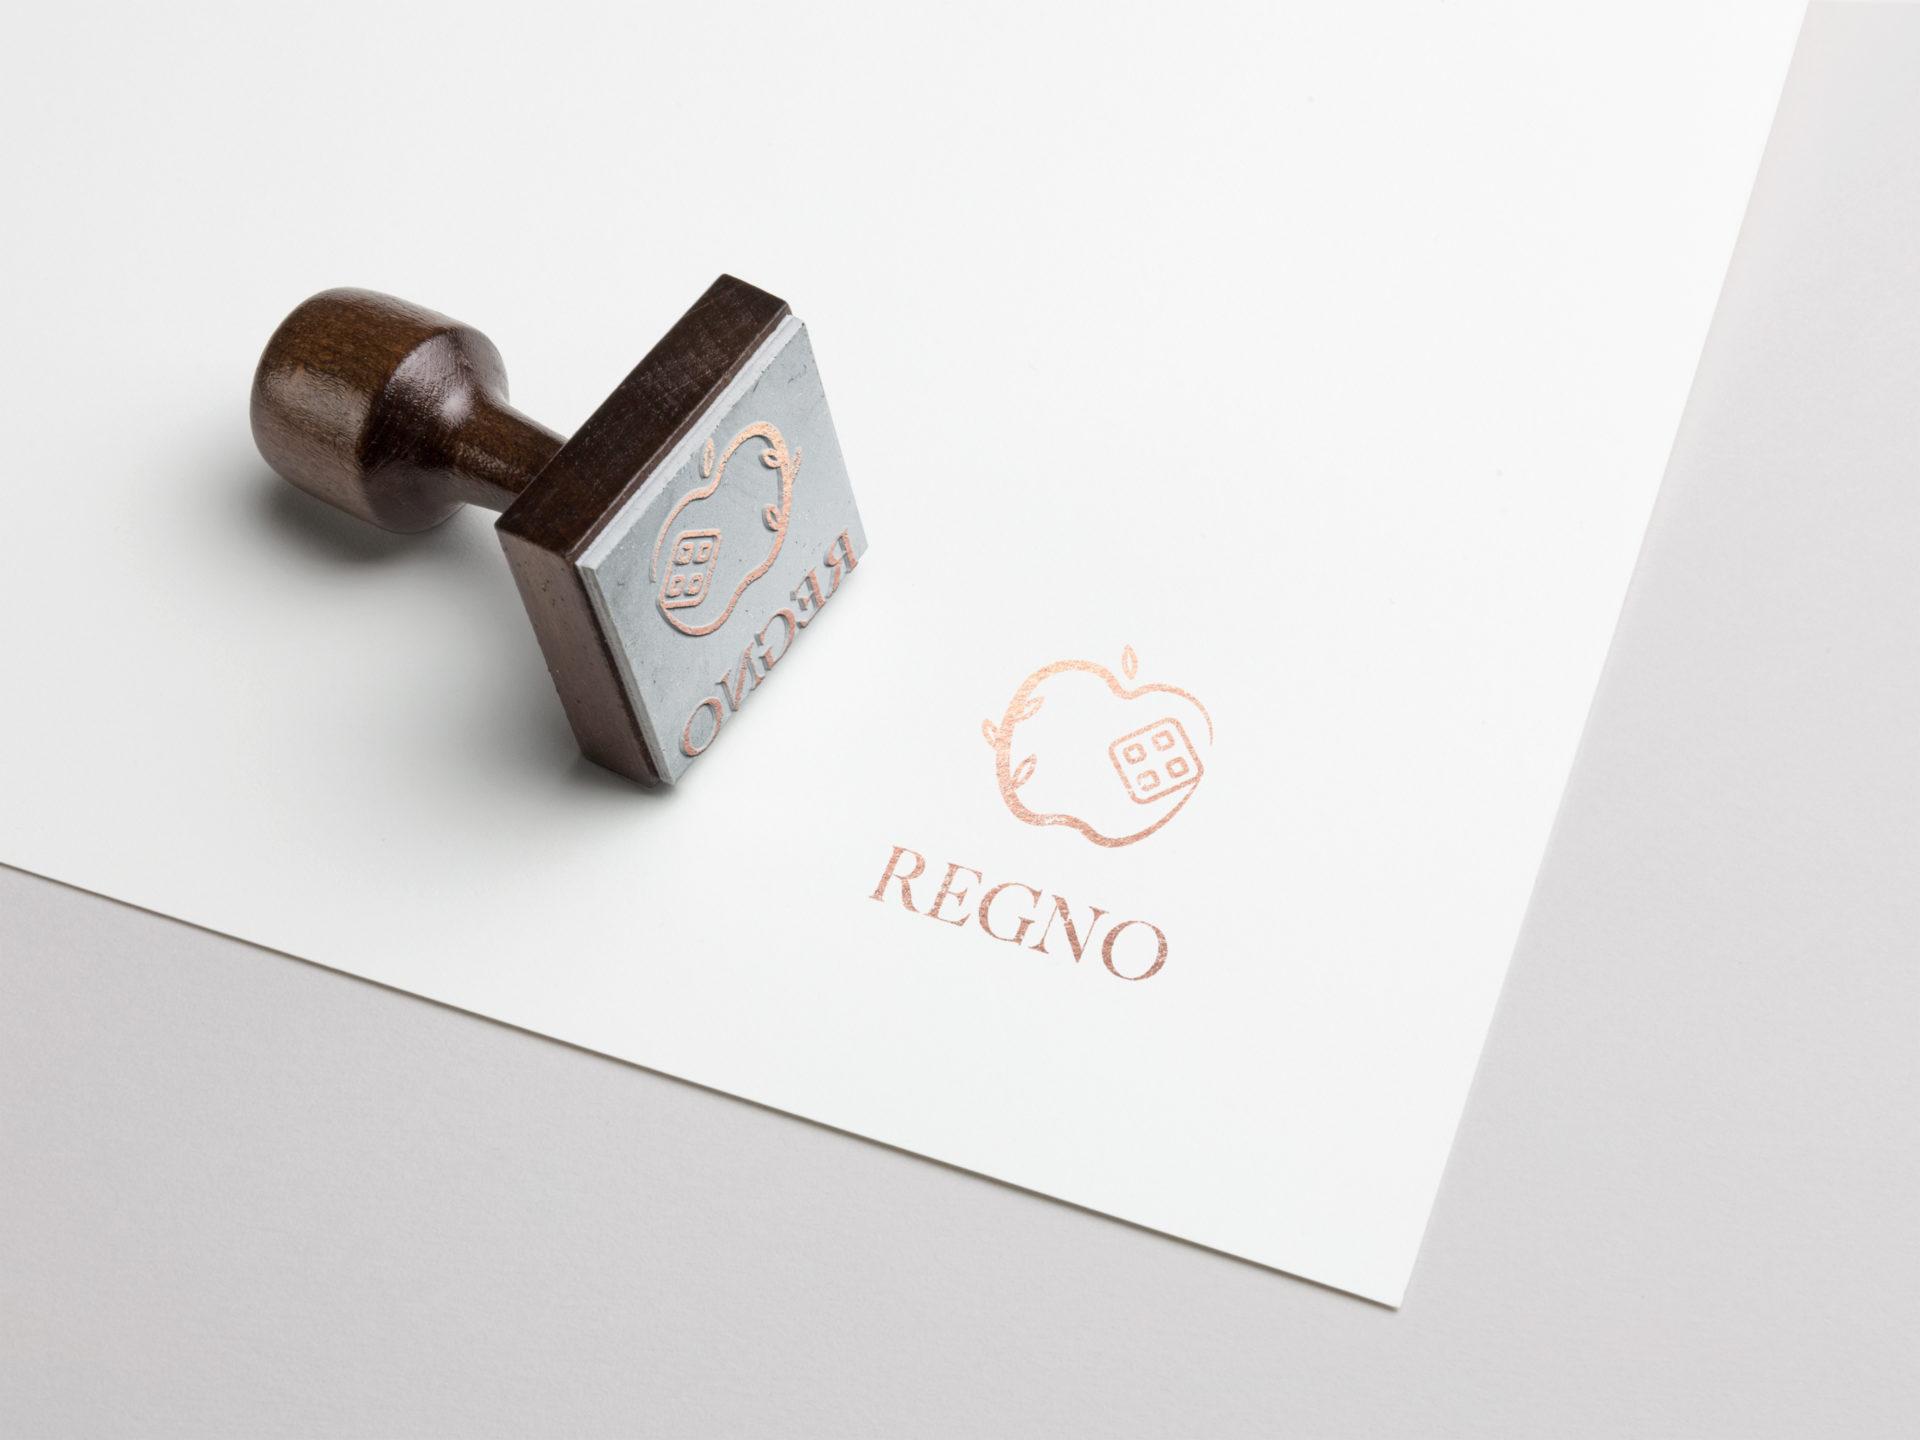 identite-visuelle-logo-professionnel-haut-de-gamme-feminin-tampon-regno